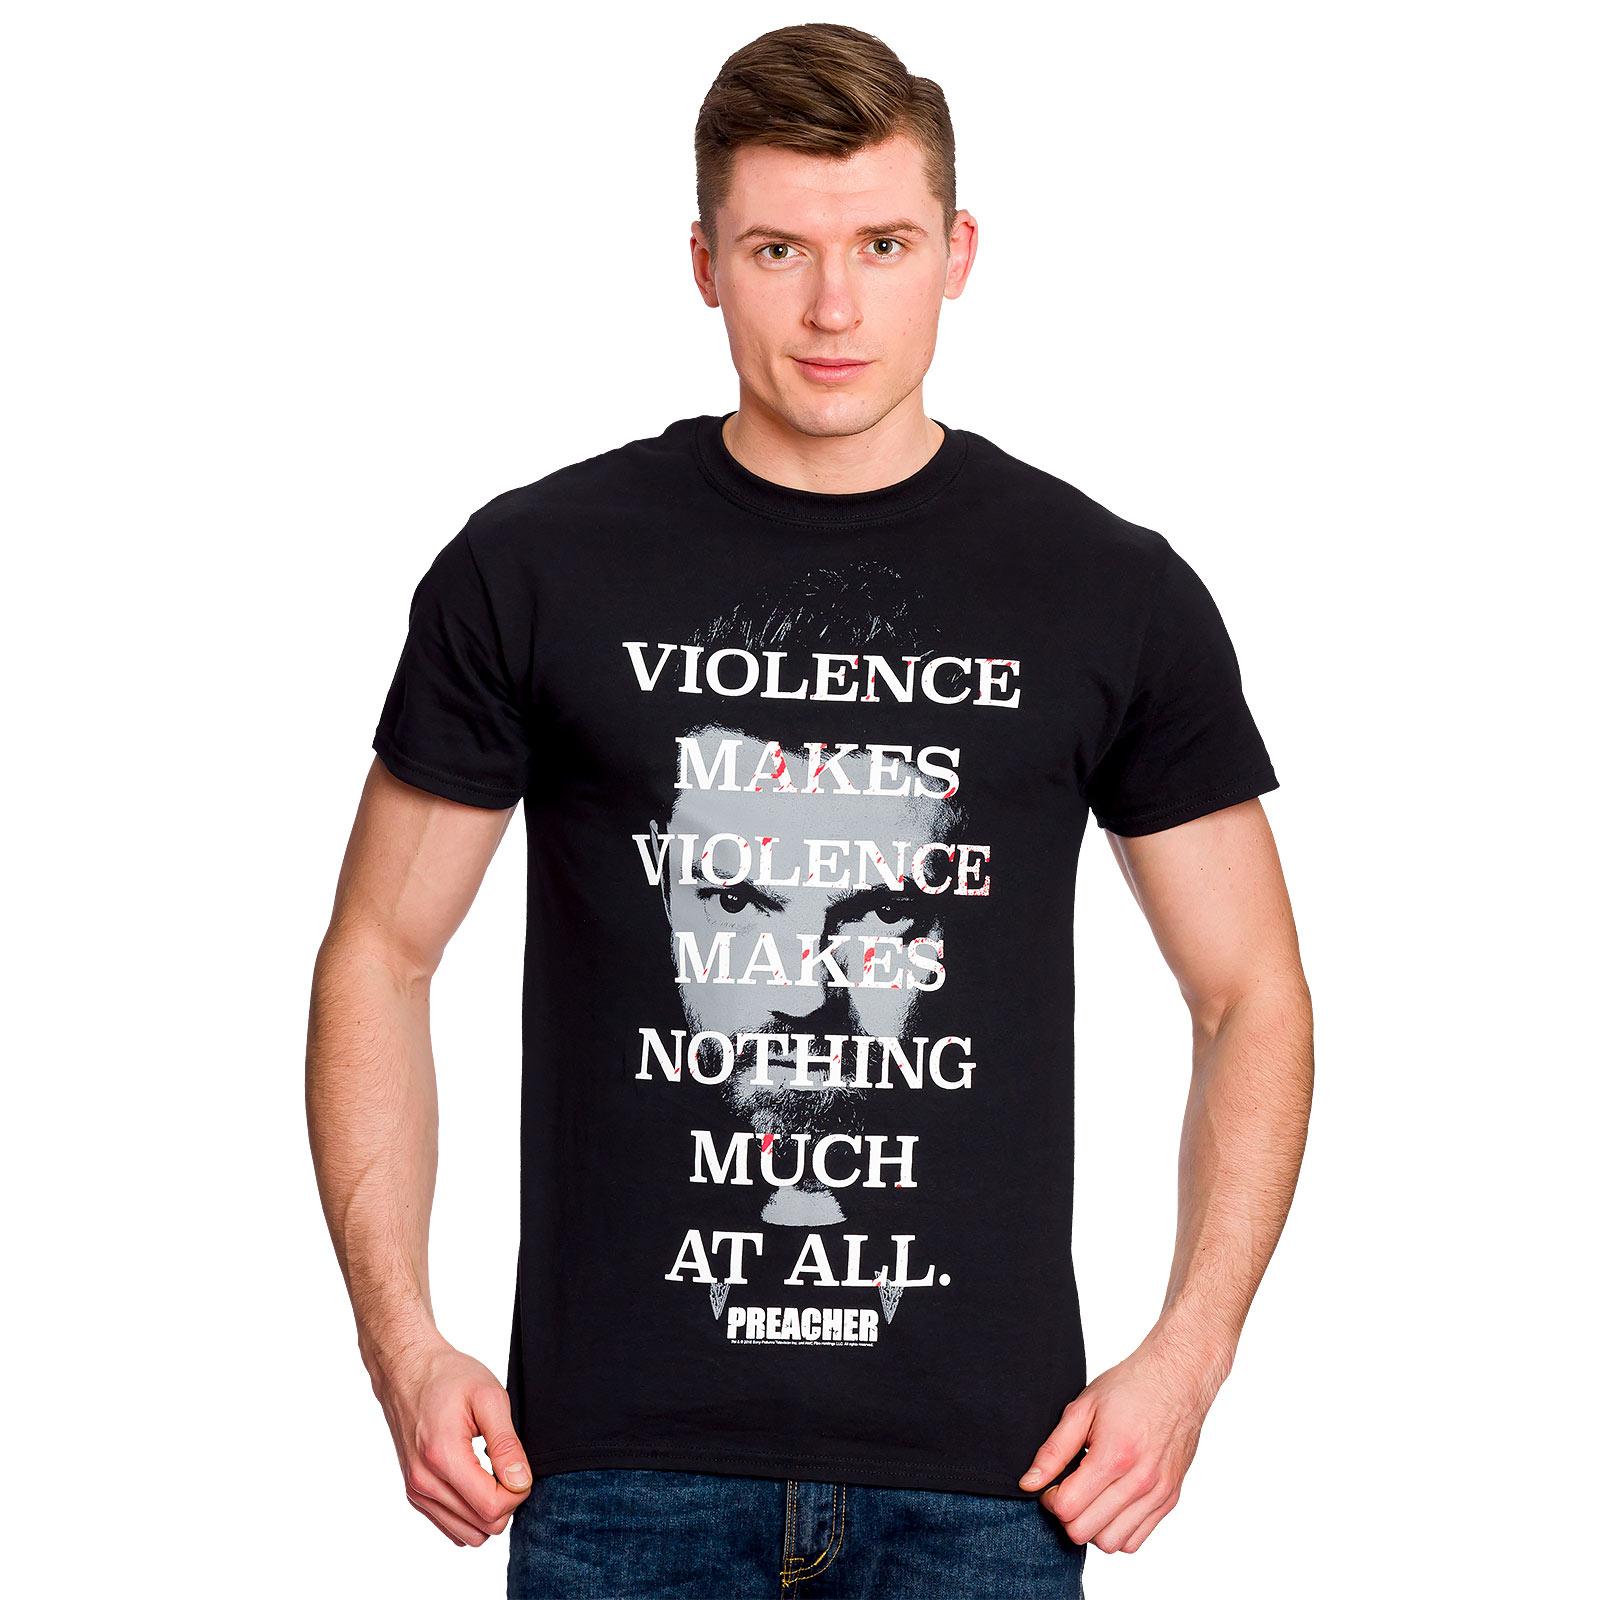 Preacher - Violence Makes Violence T-Shirt schwarz